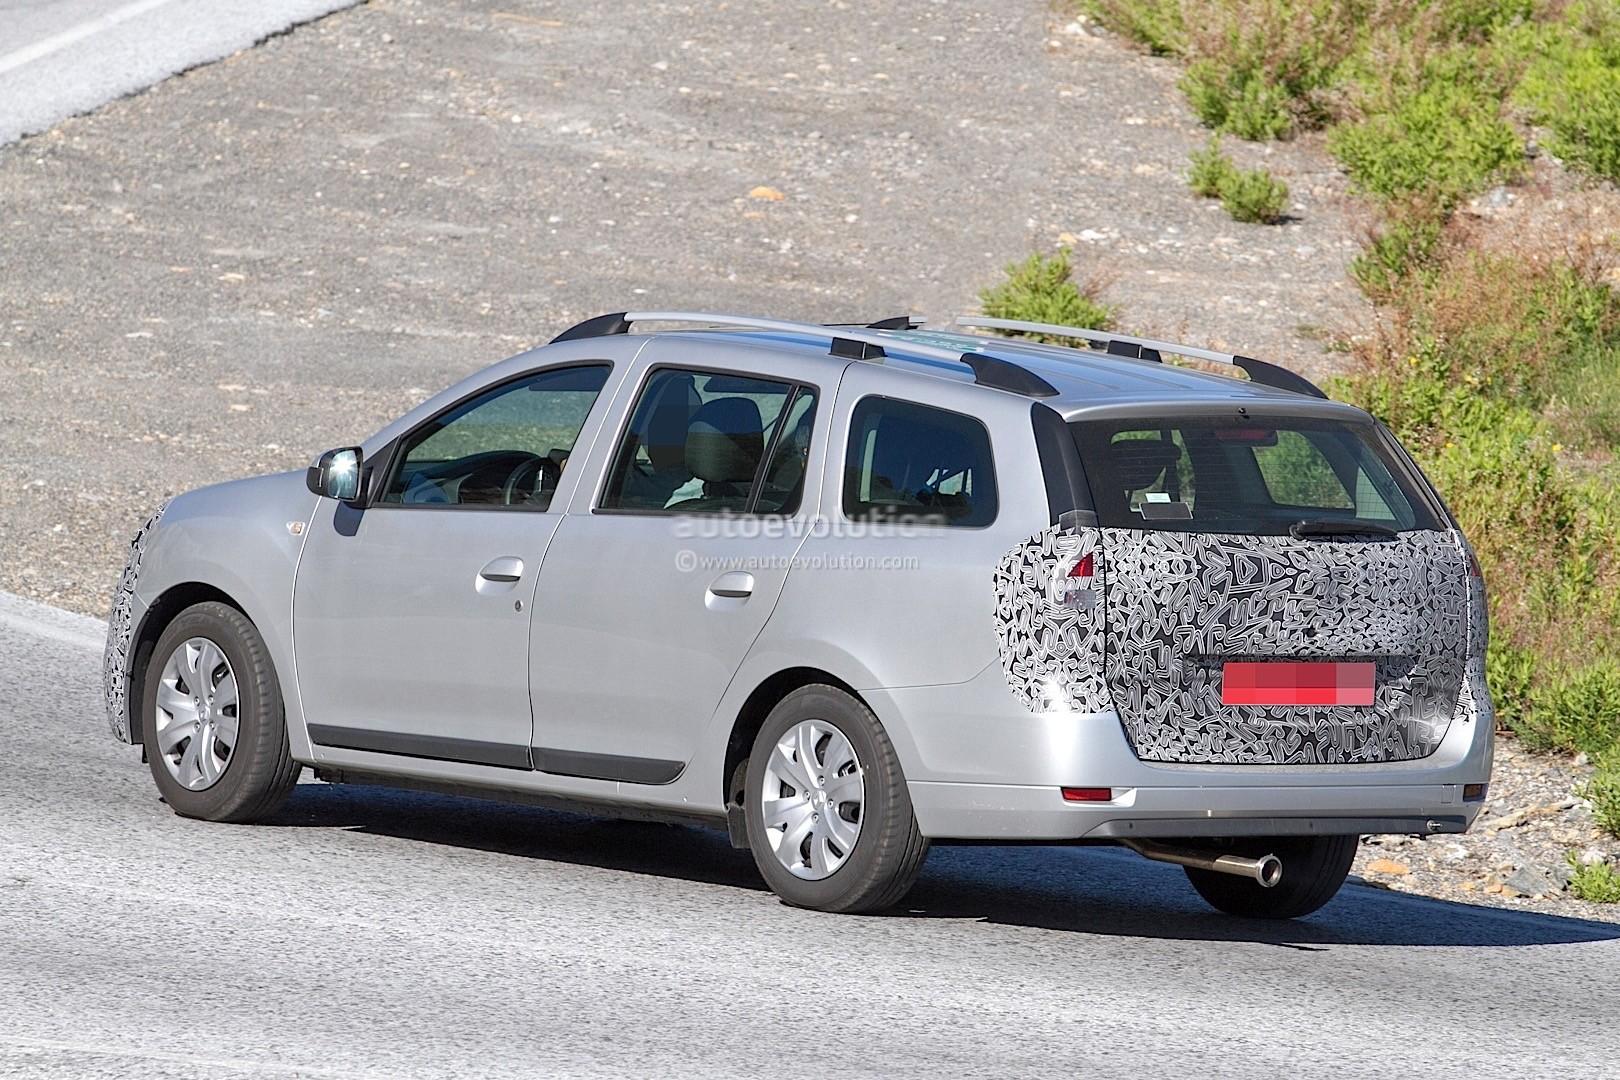 Challenger 2017 >> 2017 Dacia Sandero Facelift & 2017 Dacia Logan MCV Facelift Spied - autoevolution